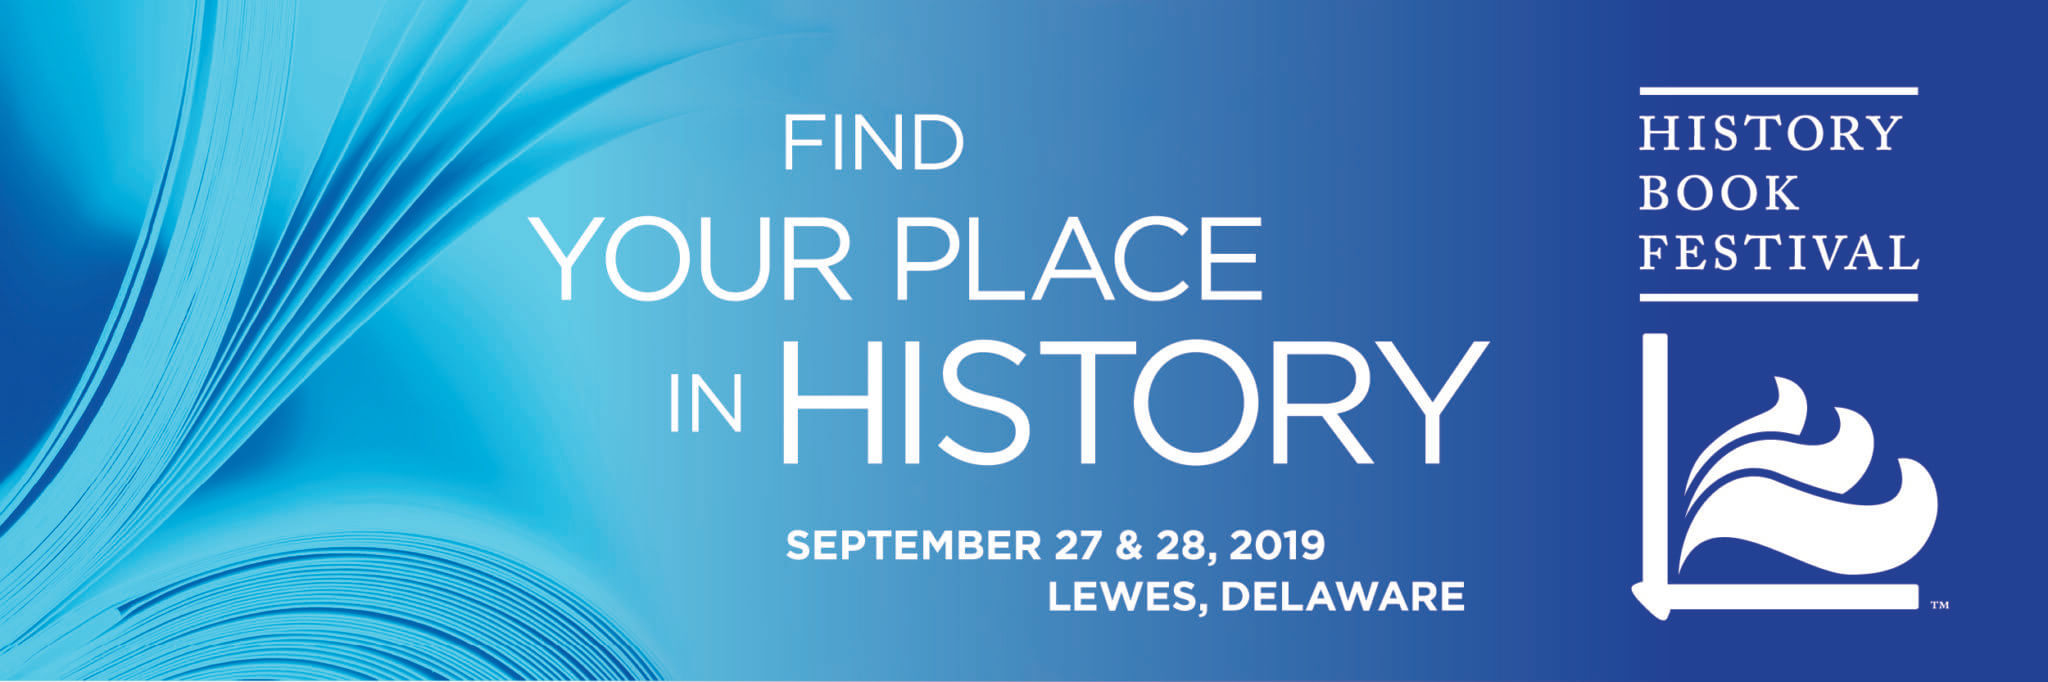 Lewes History Book Festival logo